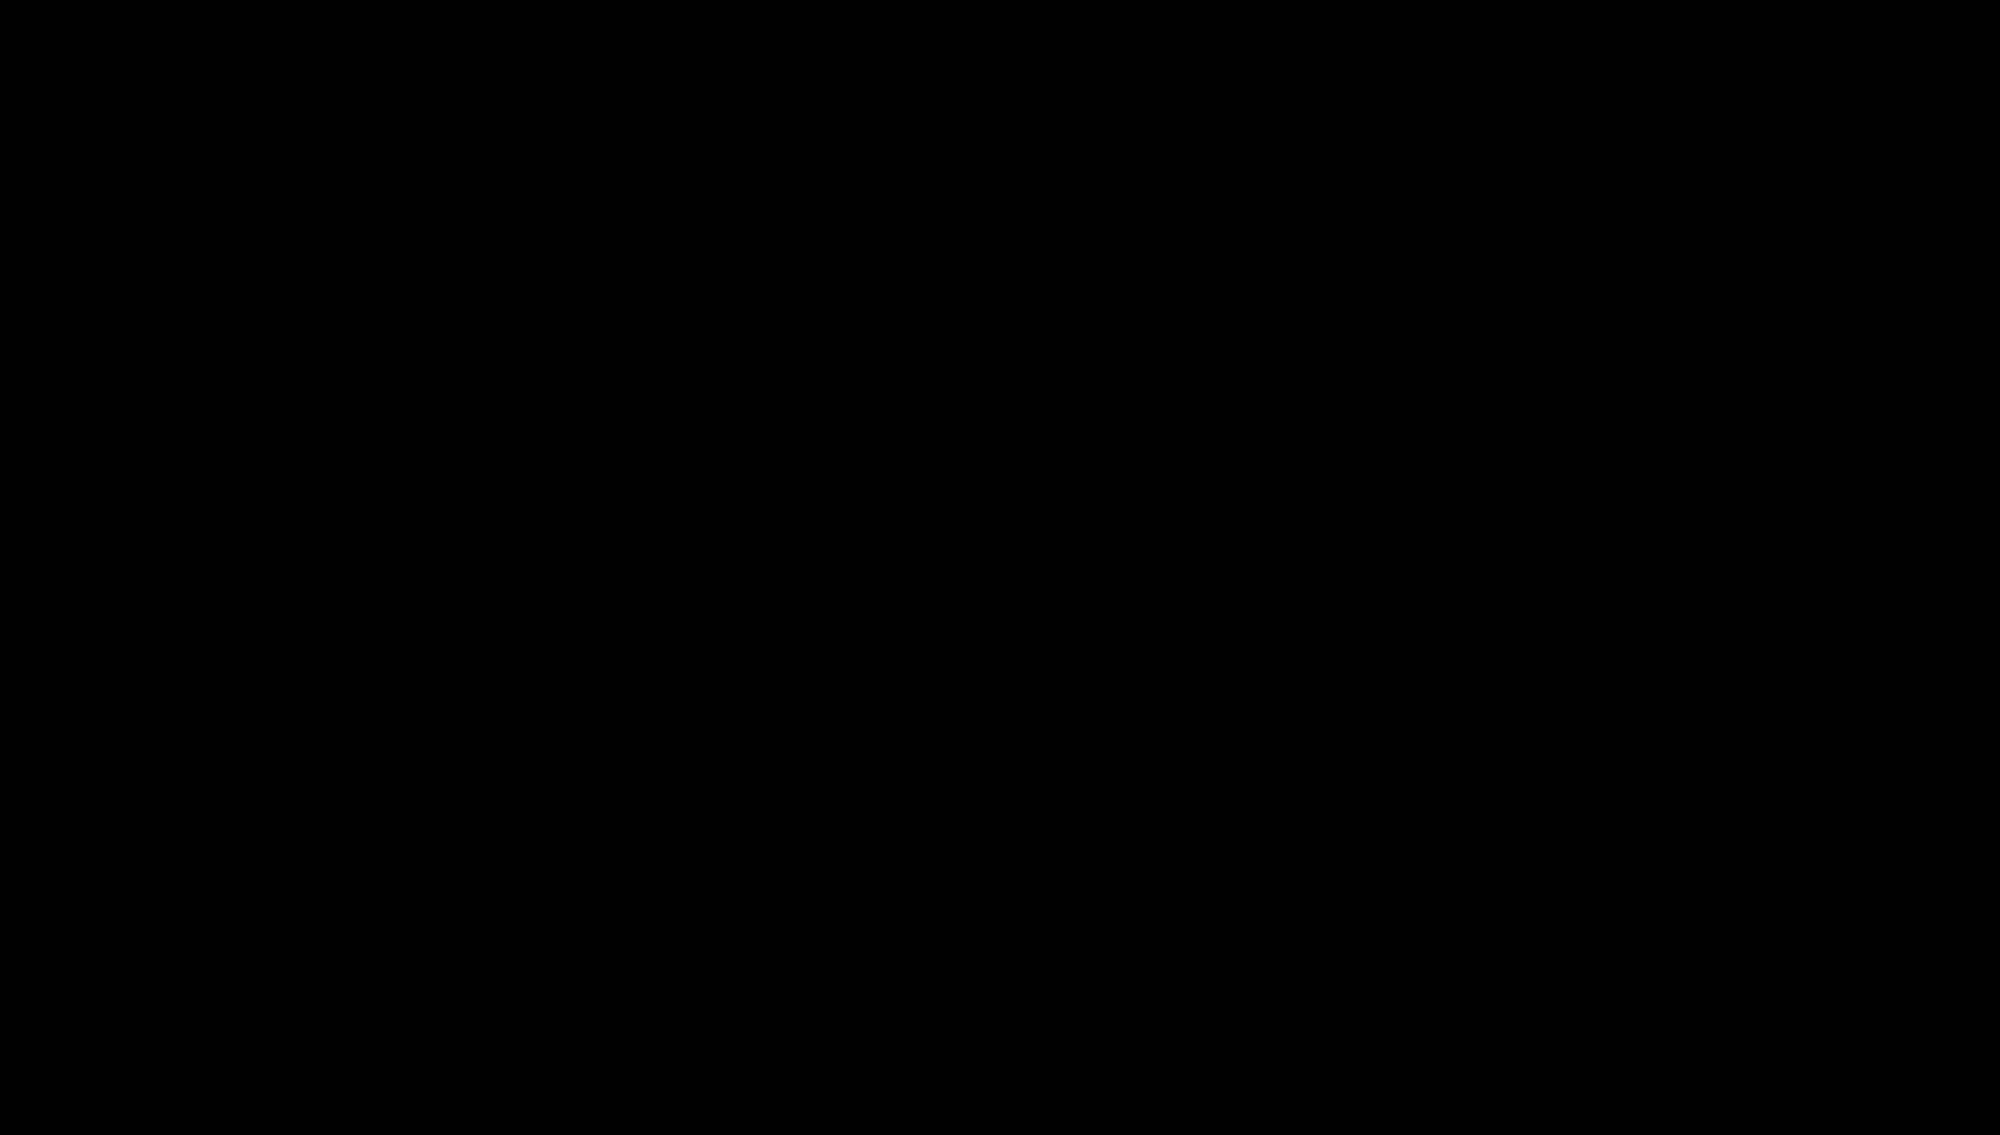 Scuba Diver Silhouette Clipart